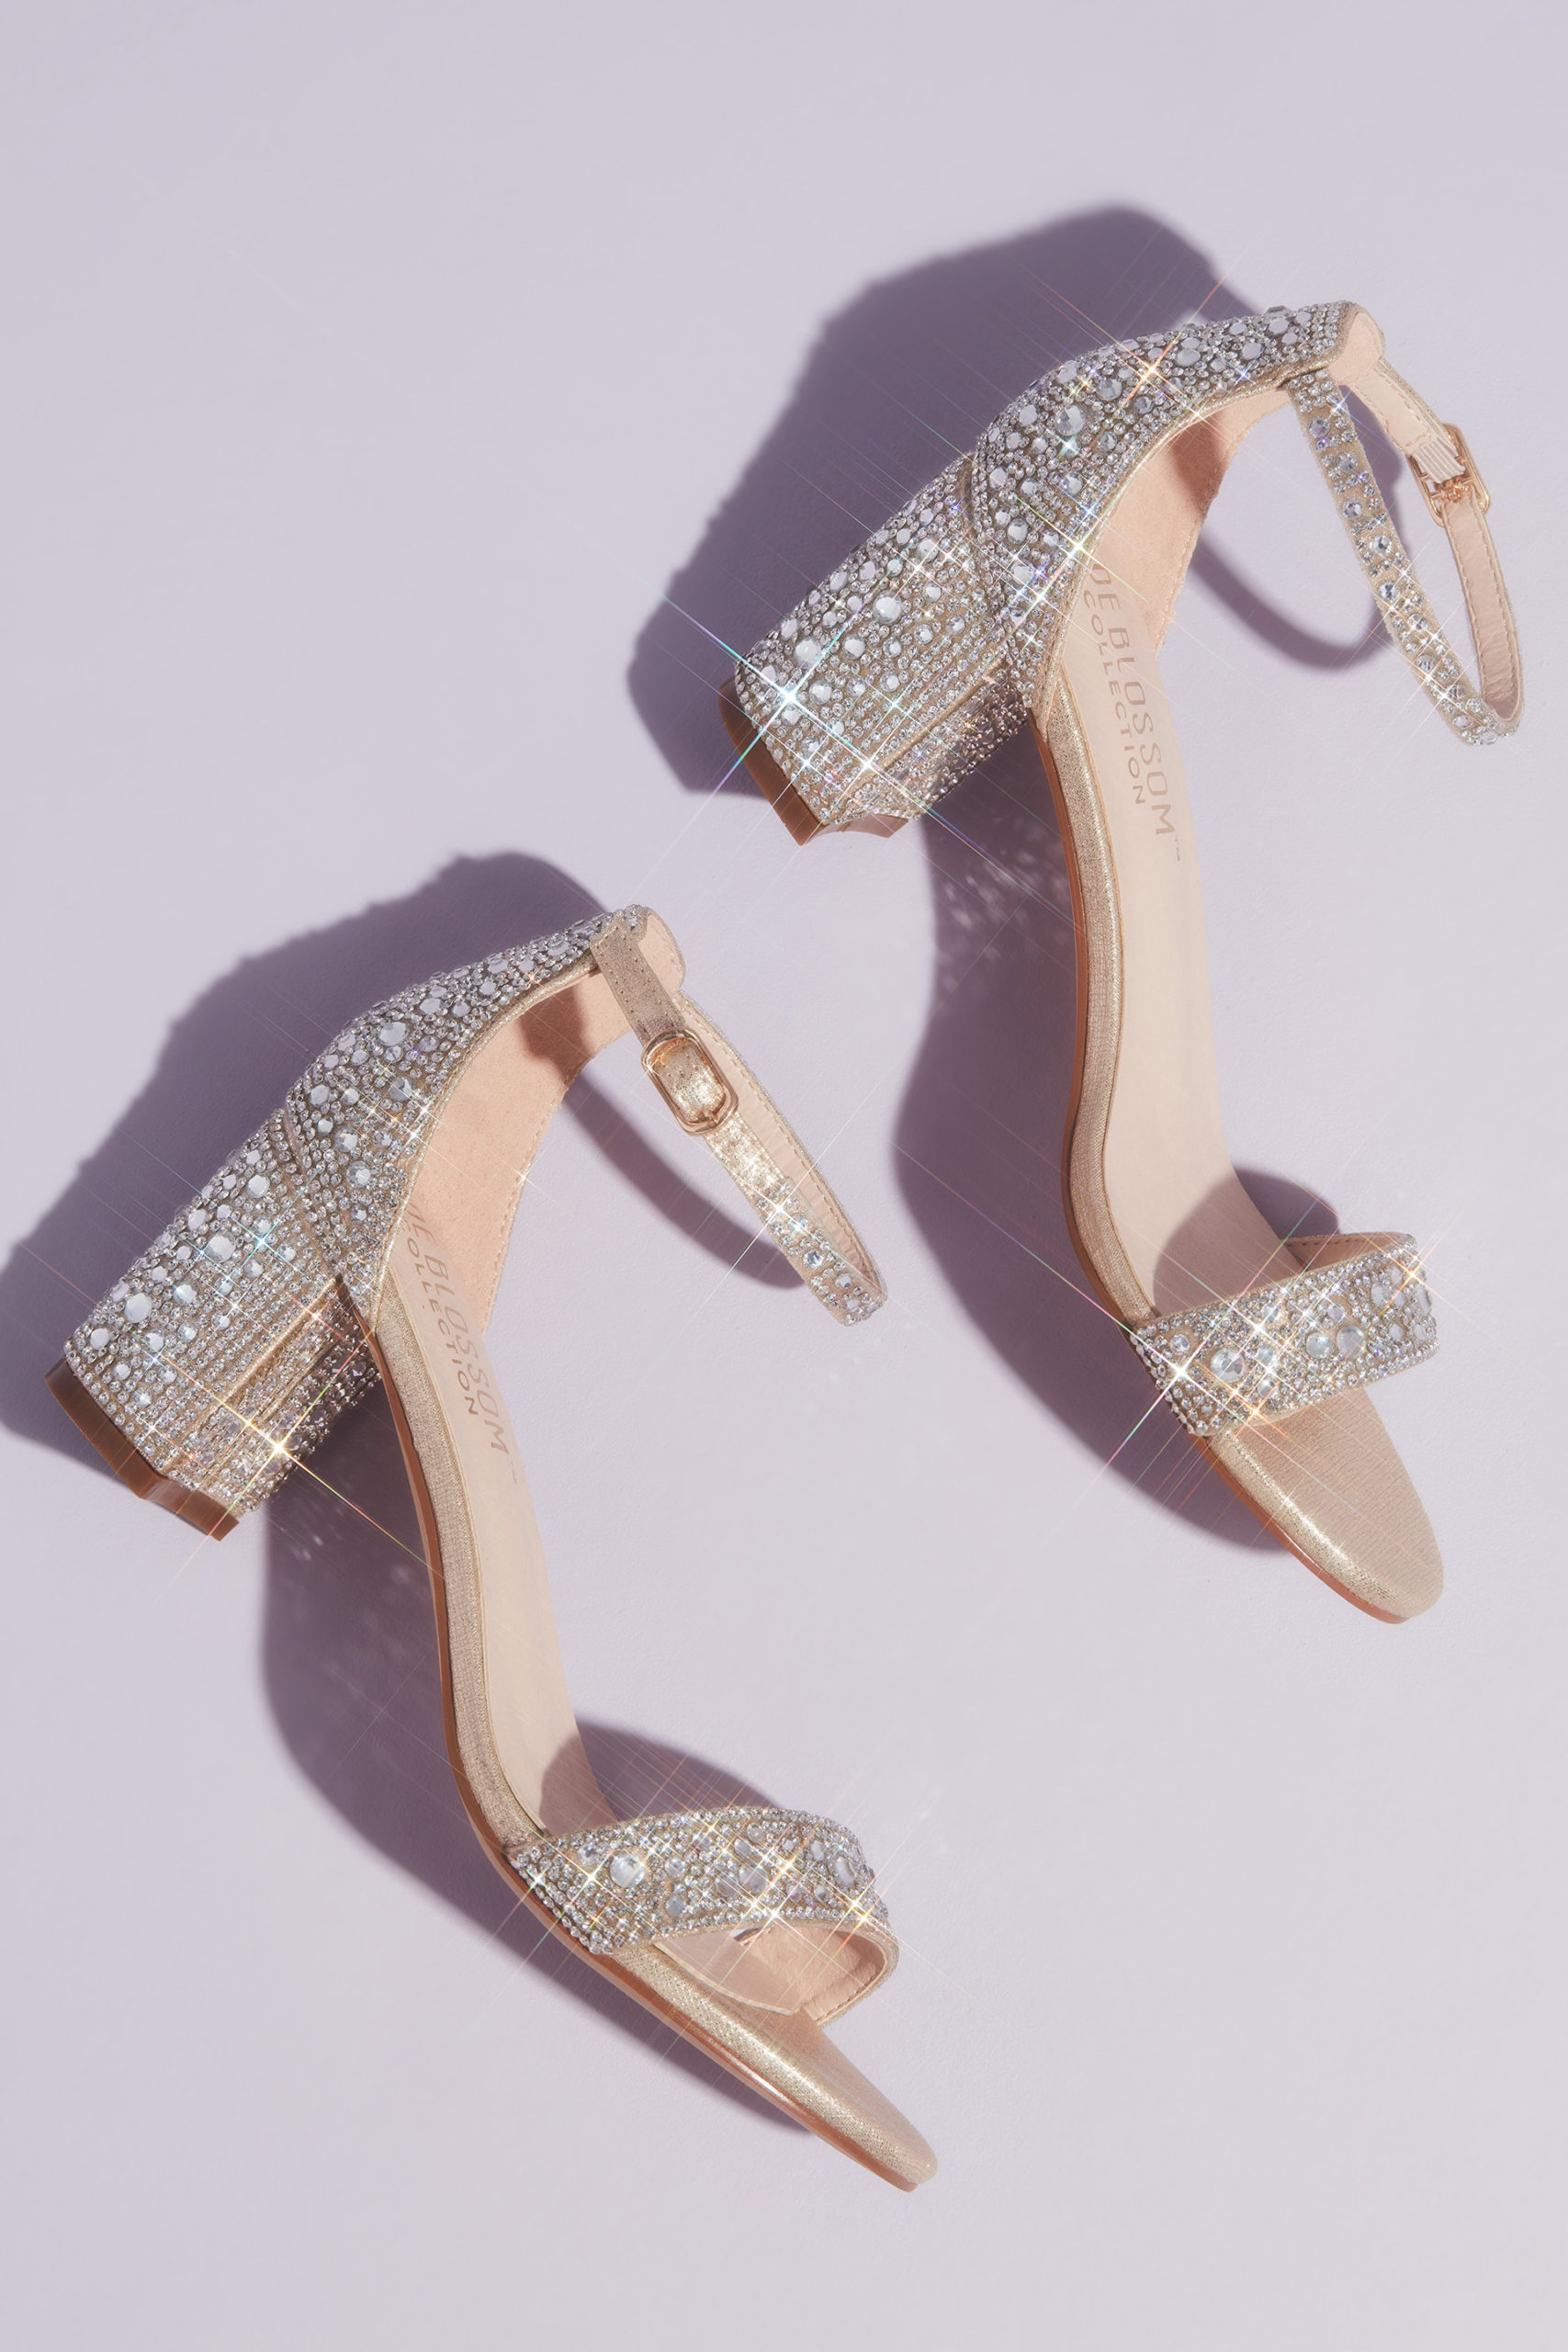 sparkly block heels for your quinceañera